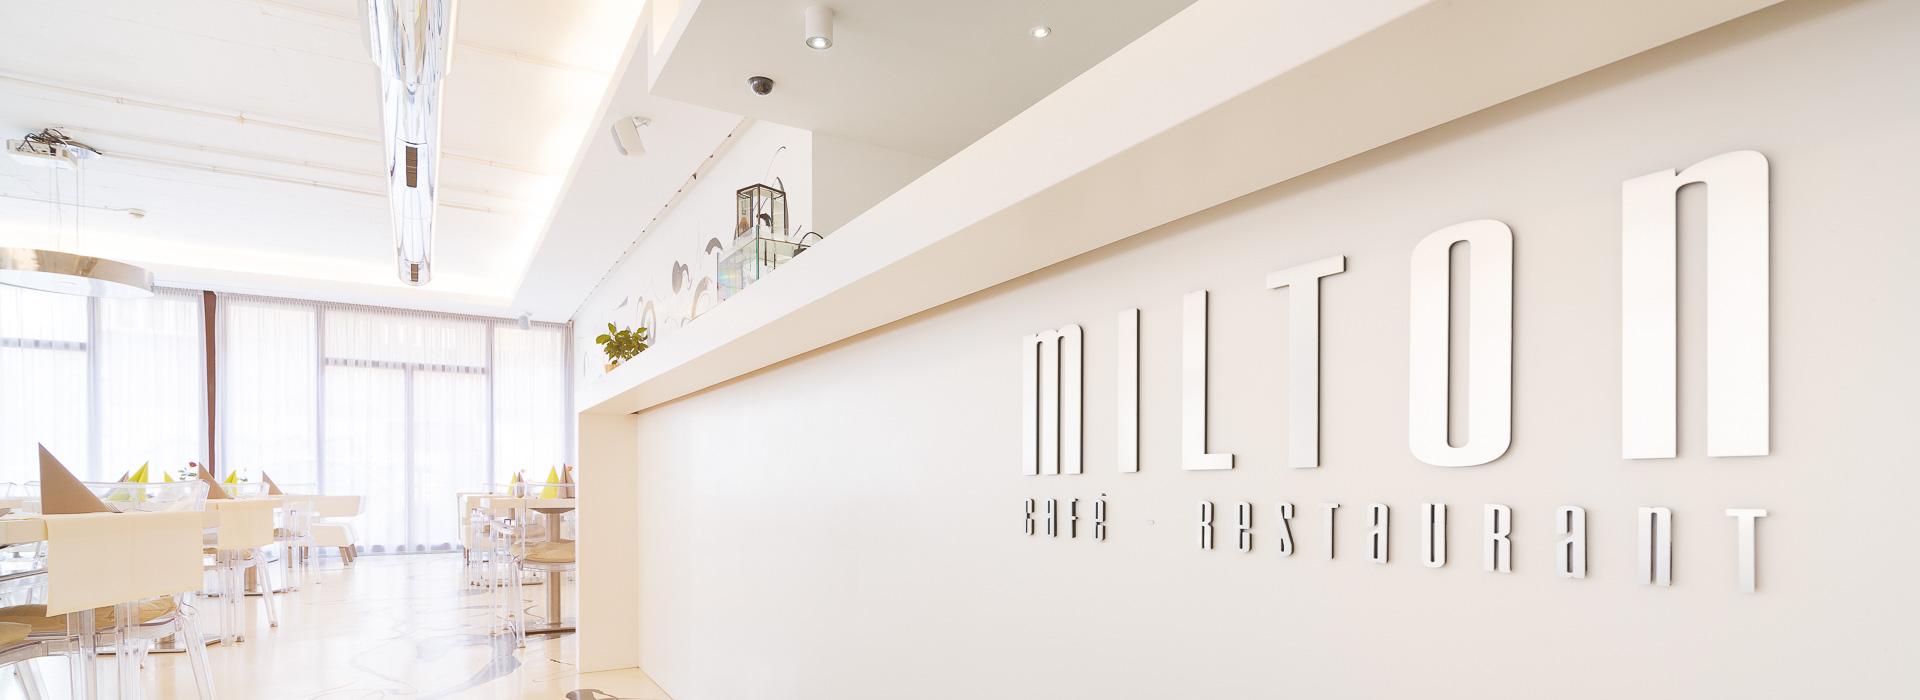 Reštaurácia Milton - priestory 1